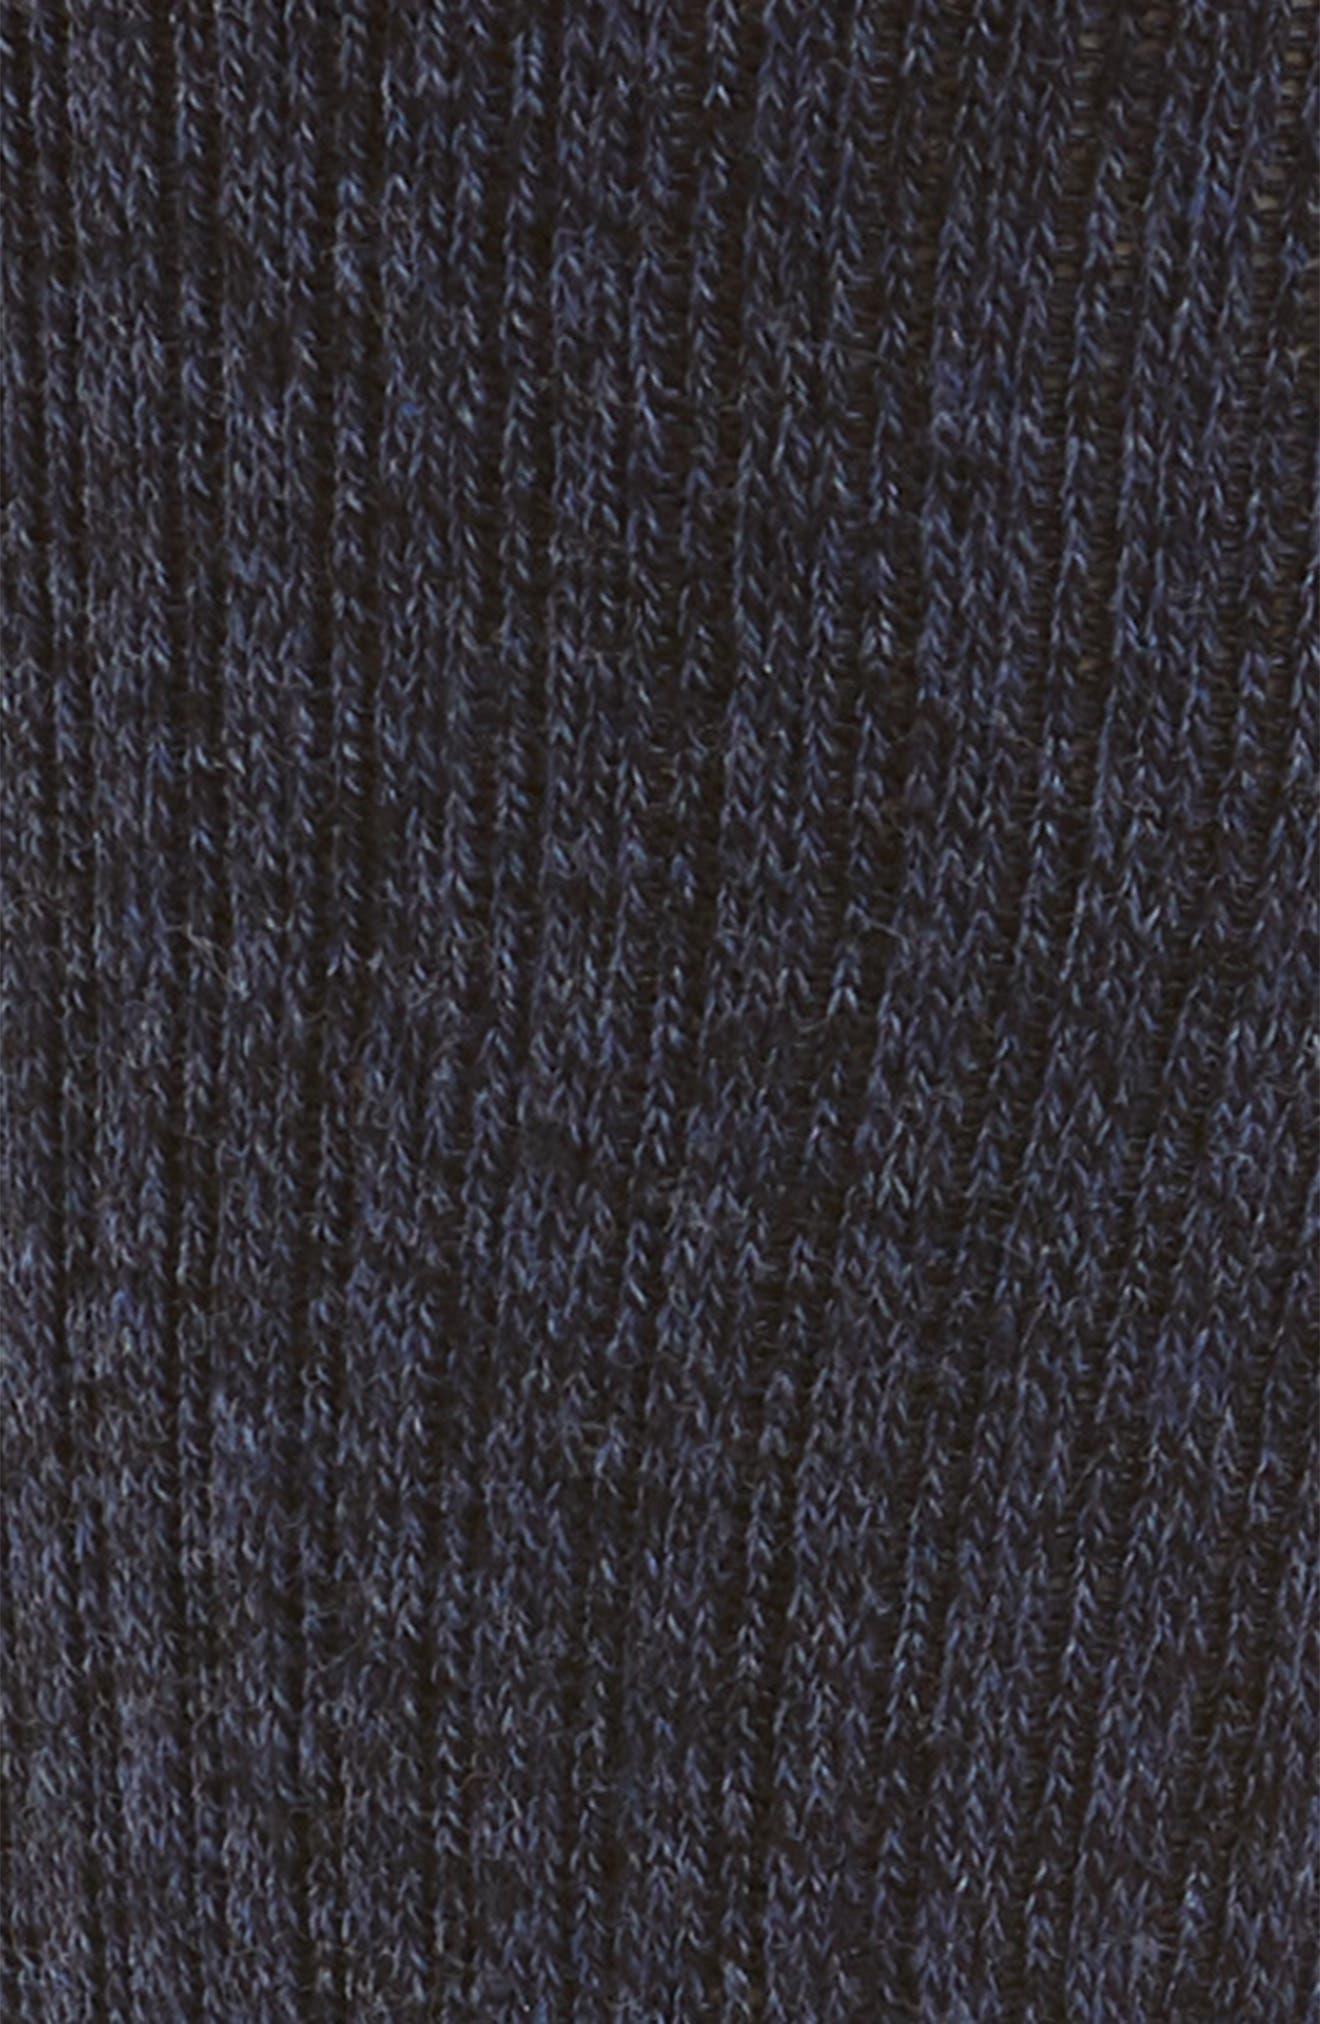 Marl Crew Socks,                             Alternate thumbnail 2, color,                             Navy